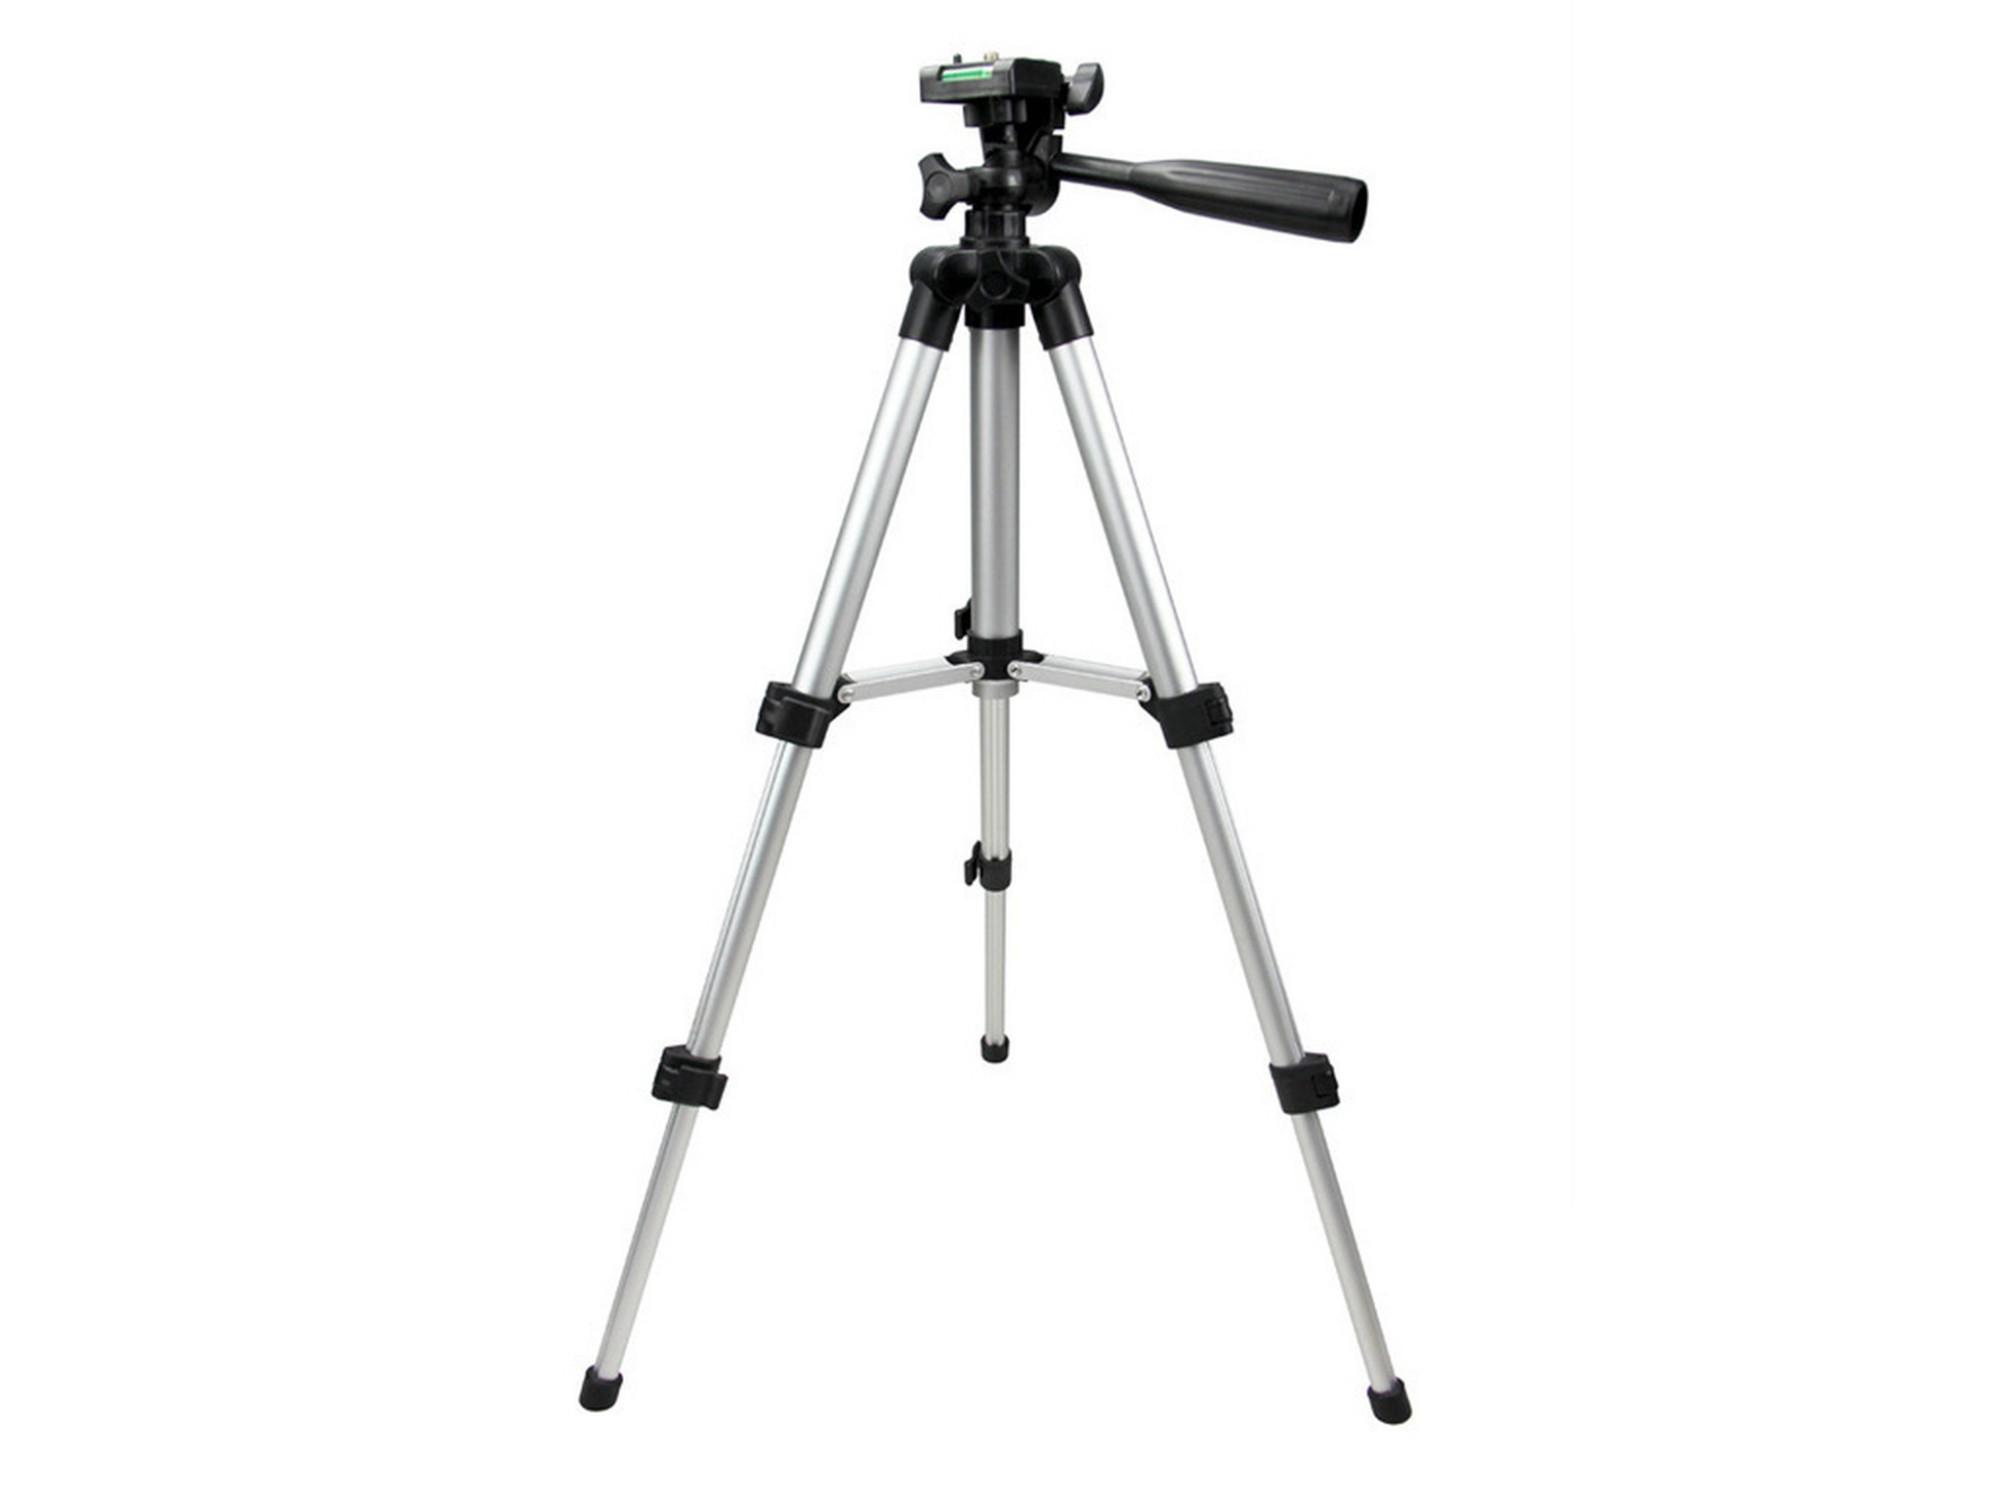 Sandberg Universal Tripod 26-60 cm